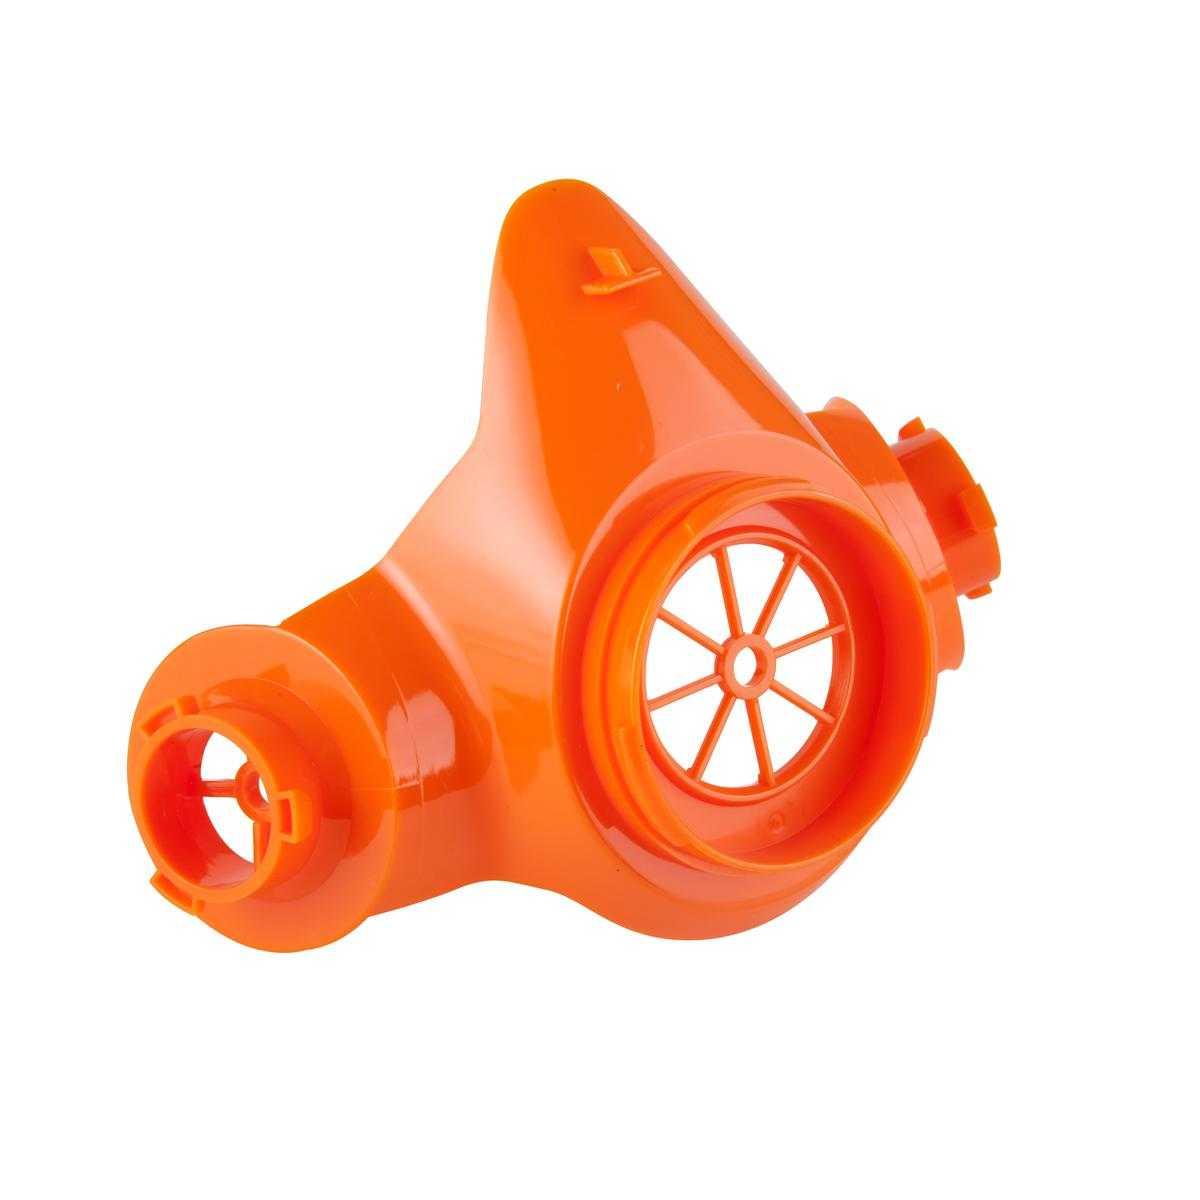 js 65201 - Основа полумаски Jeta Safety 6500